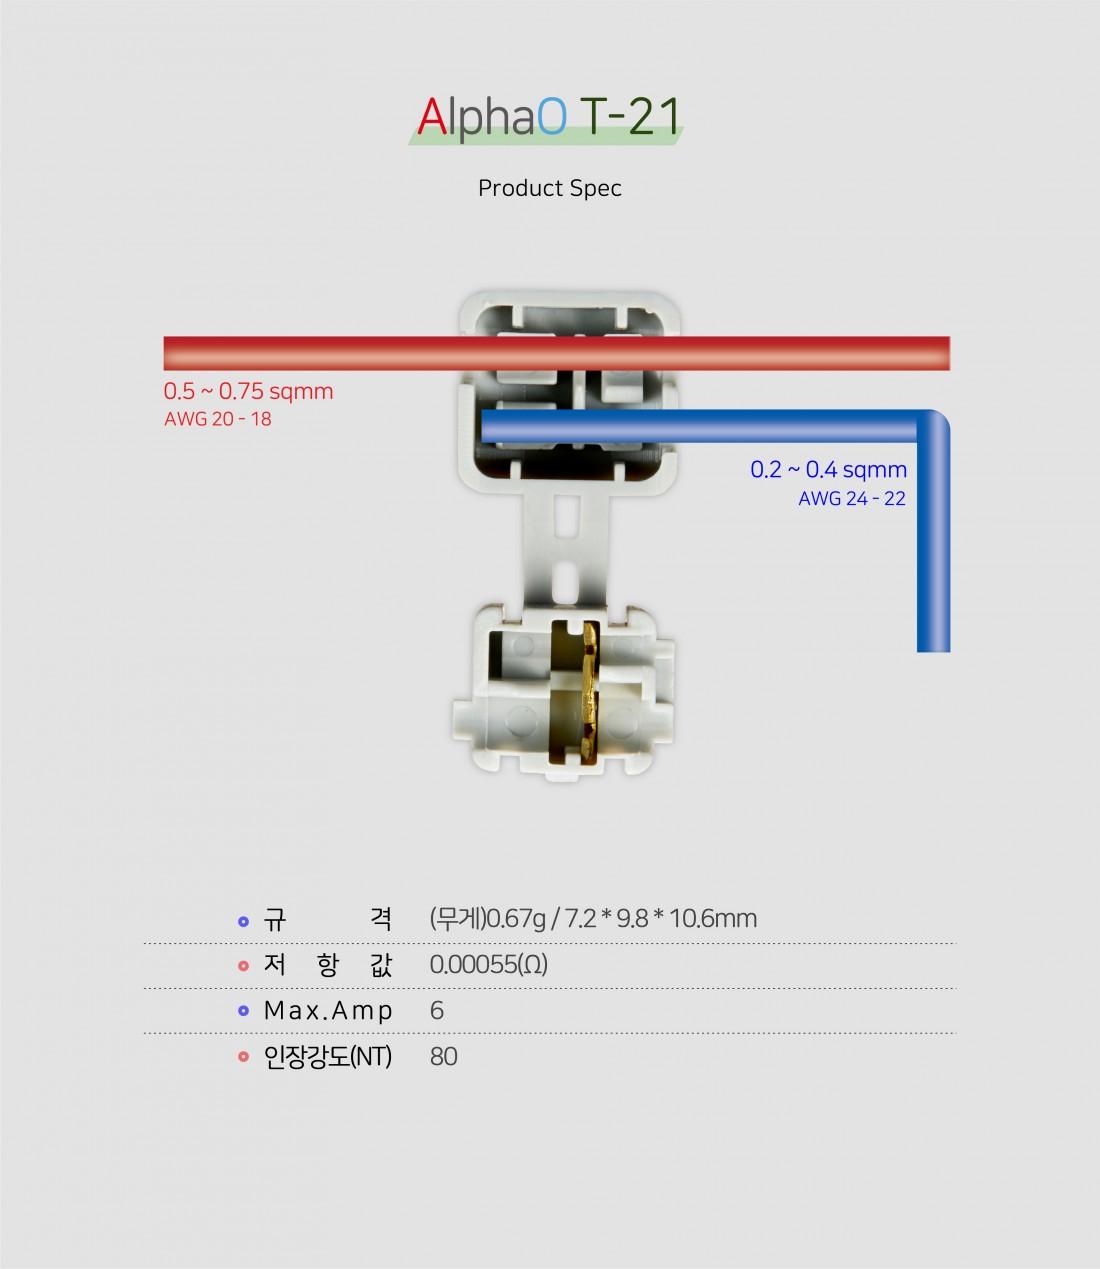 7cfa252c996ab89f9d26d54f94d6349d_1626399369_5.jpg